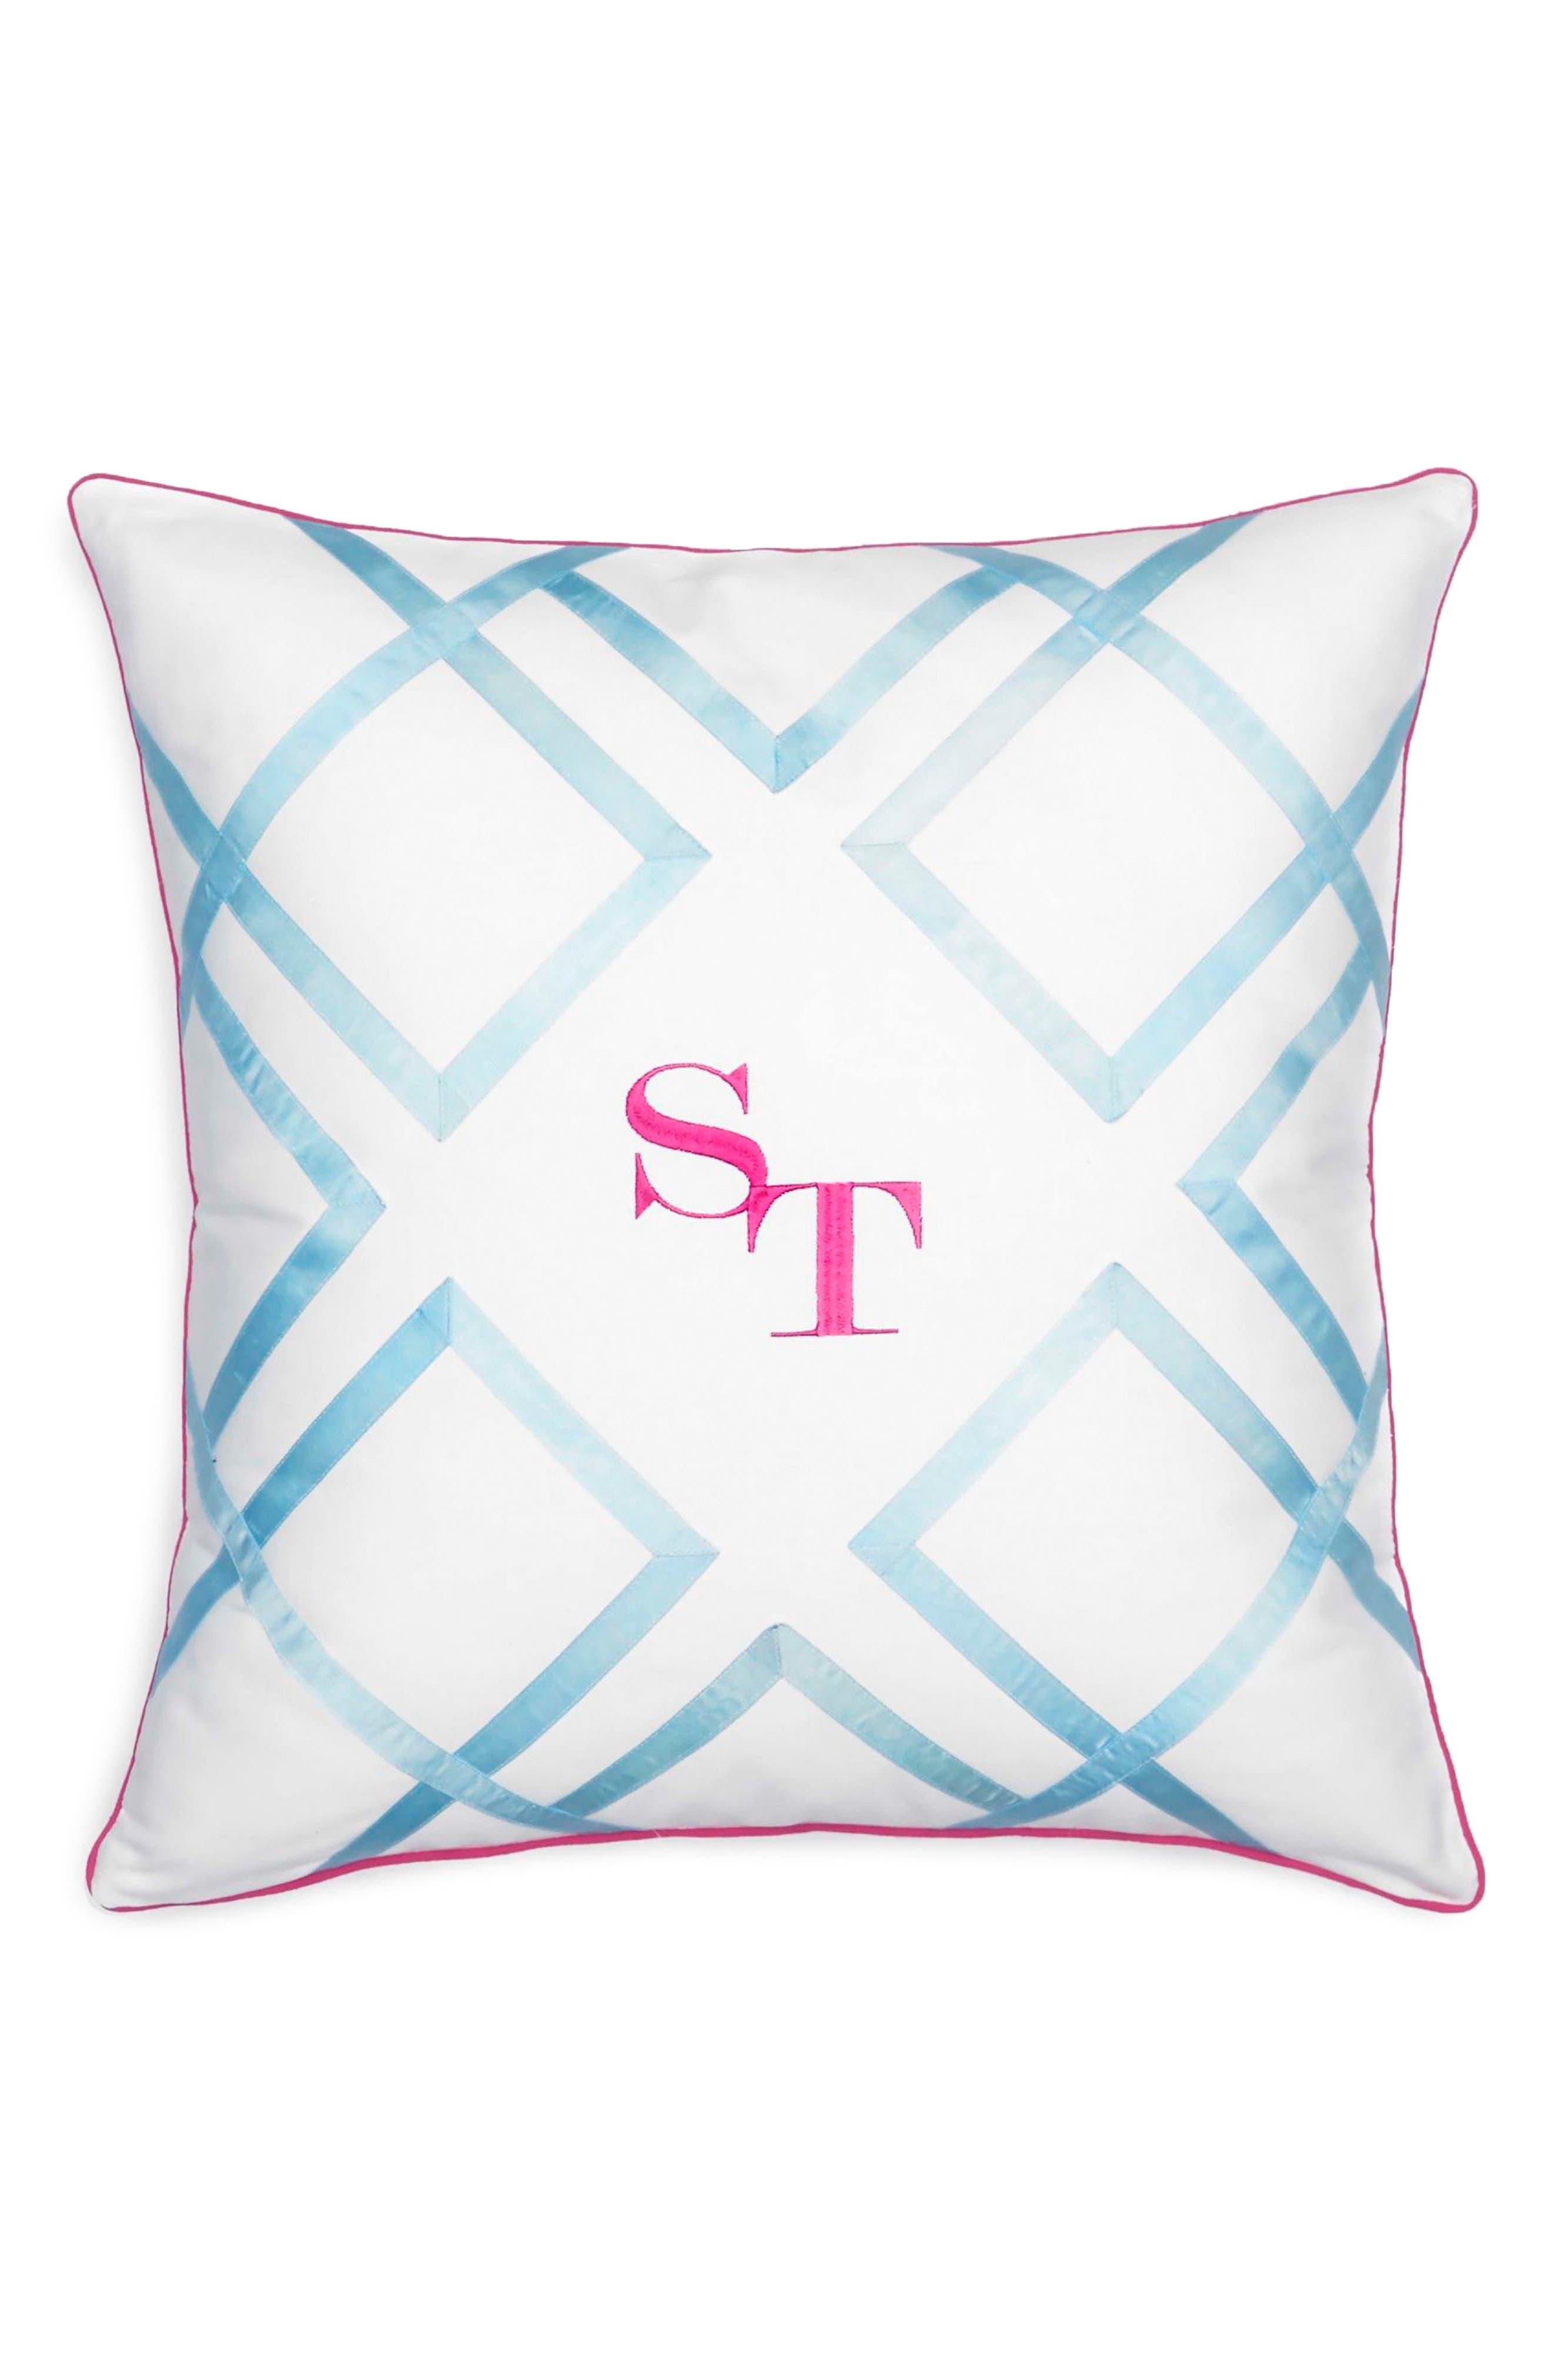 Long Bay Stripe Pillow,                             Main thumbnail 1, color,                             100